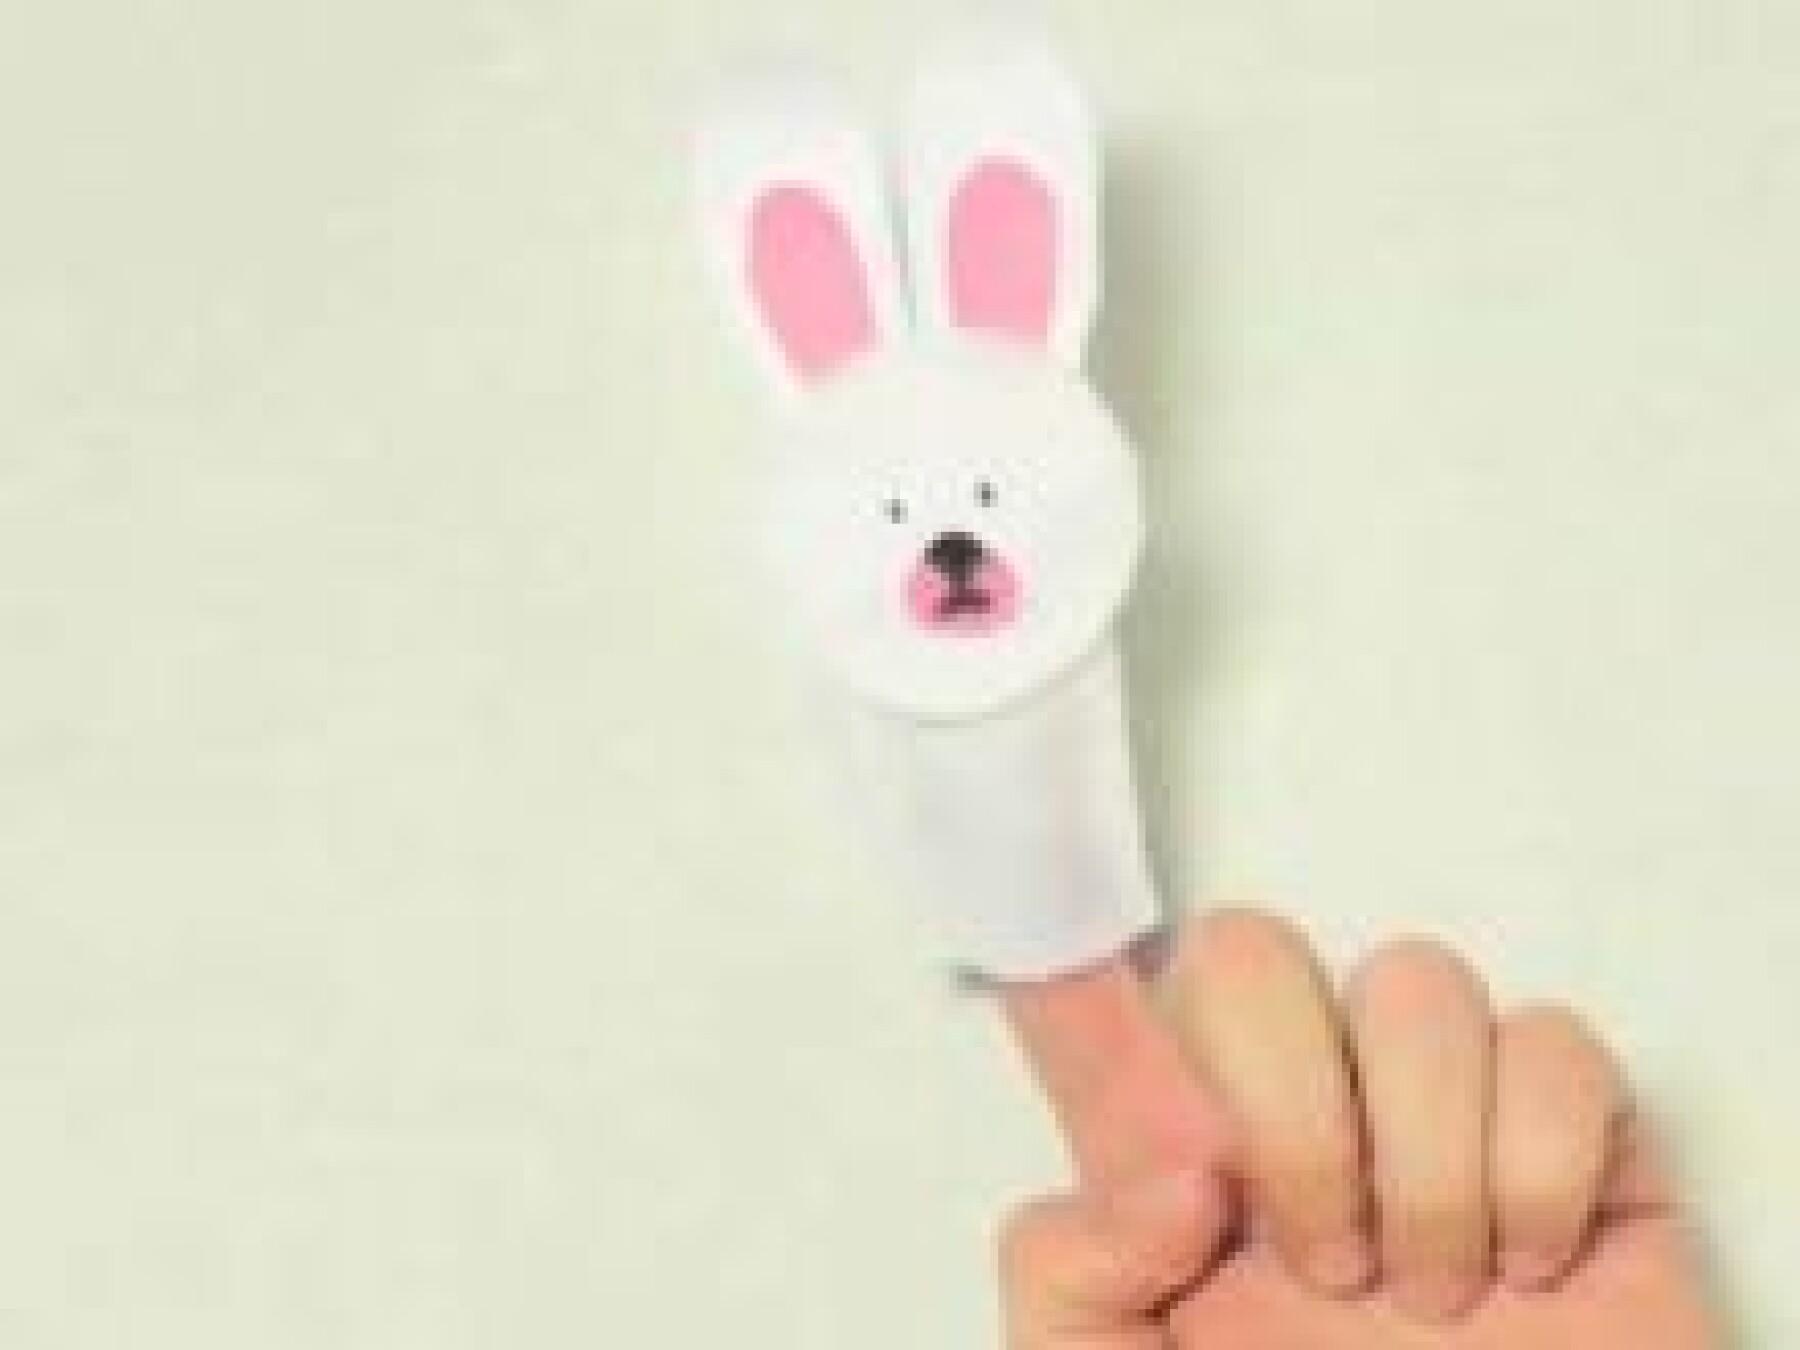 bricolage marionnette lapin